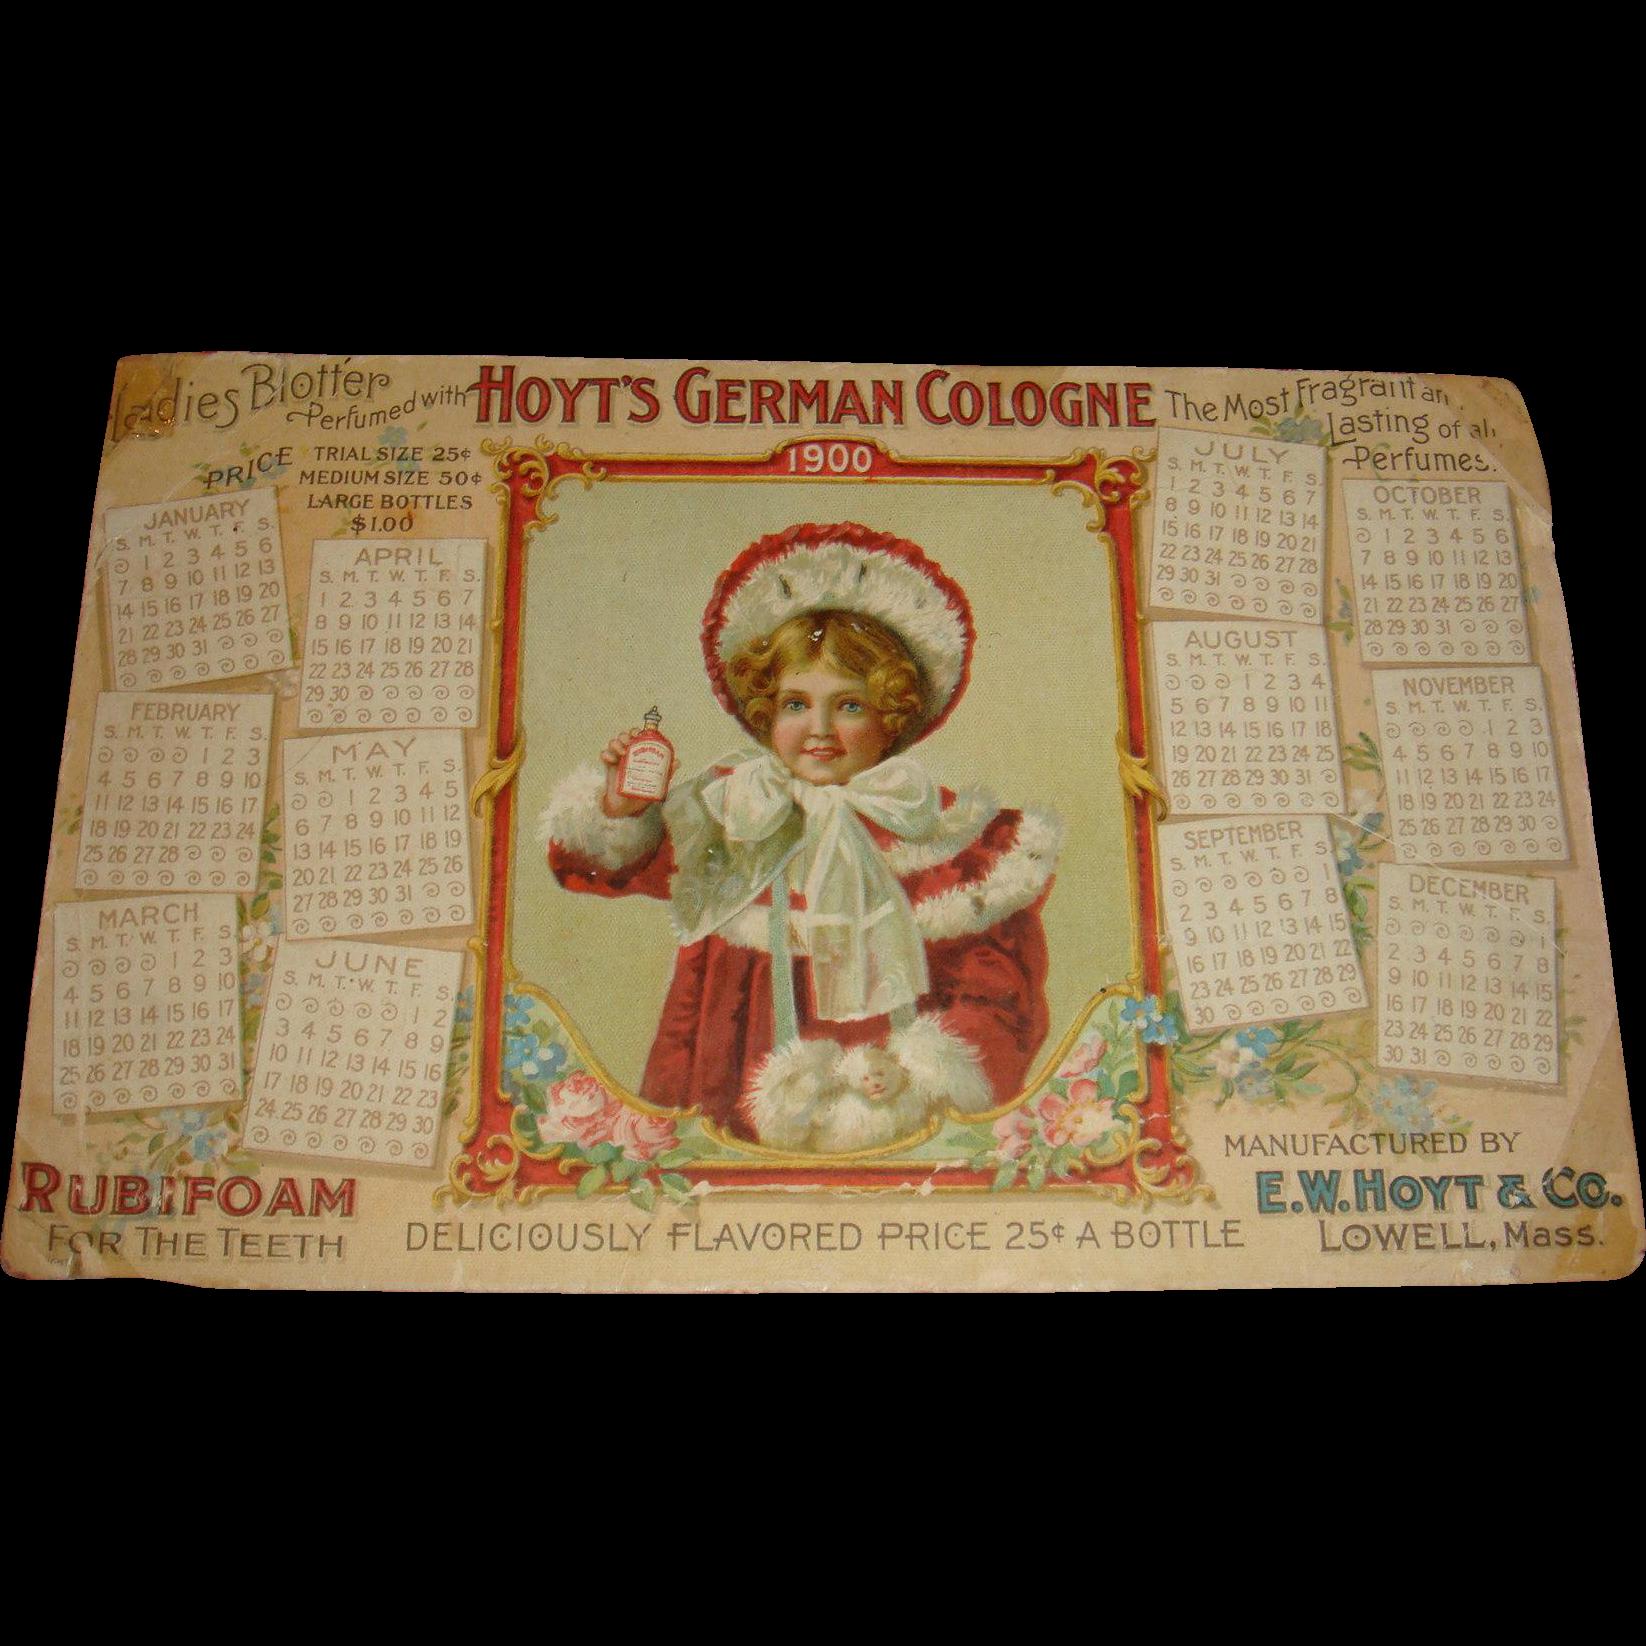 1900 Calendar Hoyt's German Cologne Ladies Blotter Adorable Child Hat, Muff, Fur